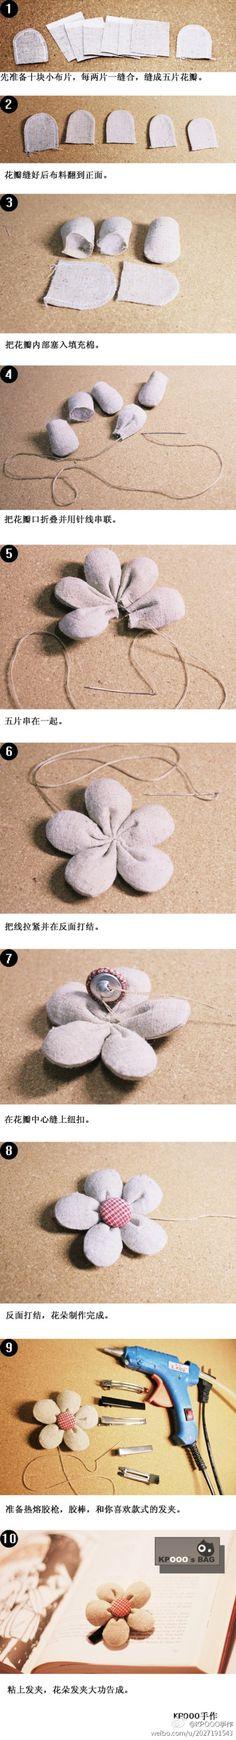 Tutorial con fotos paso a paso para hacer un broche de tela o fieltro forma flor